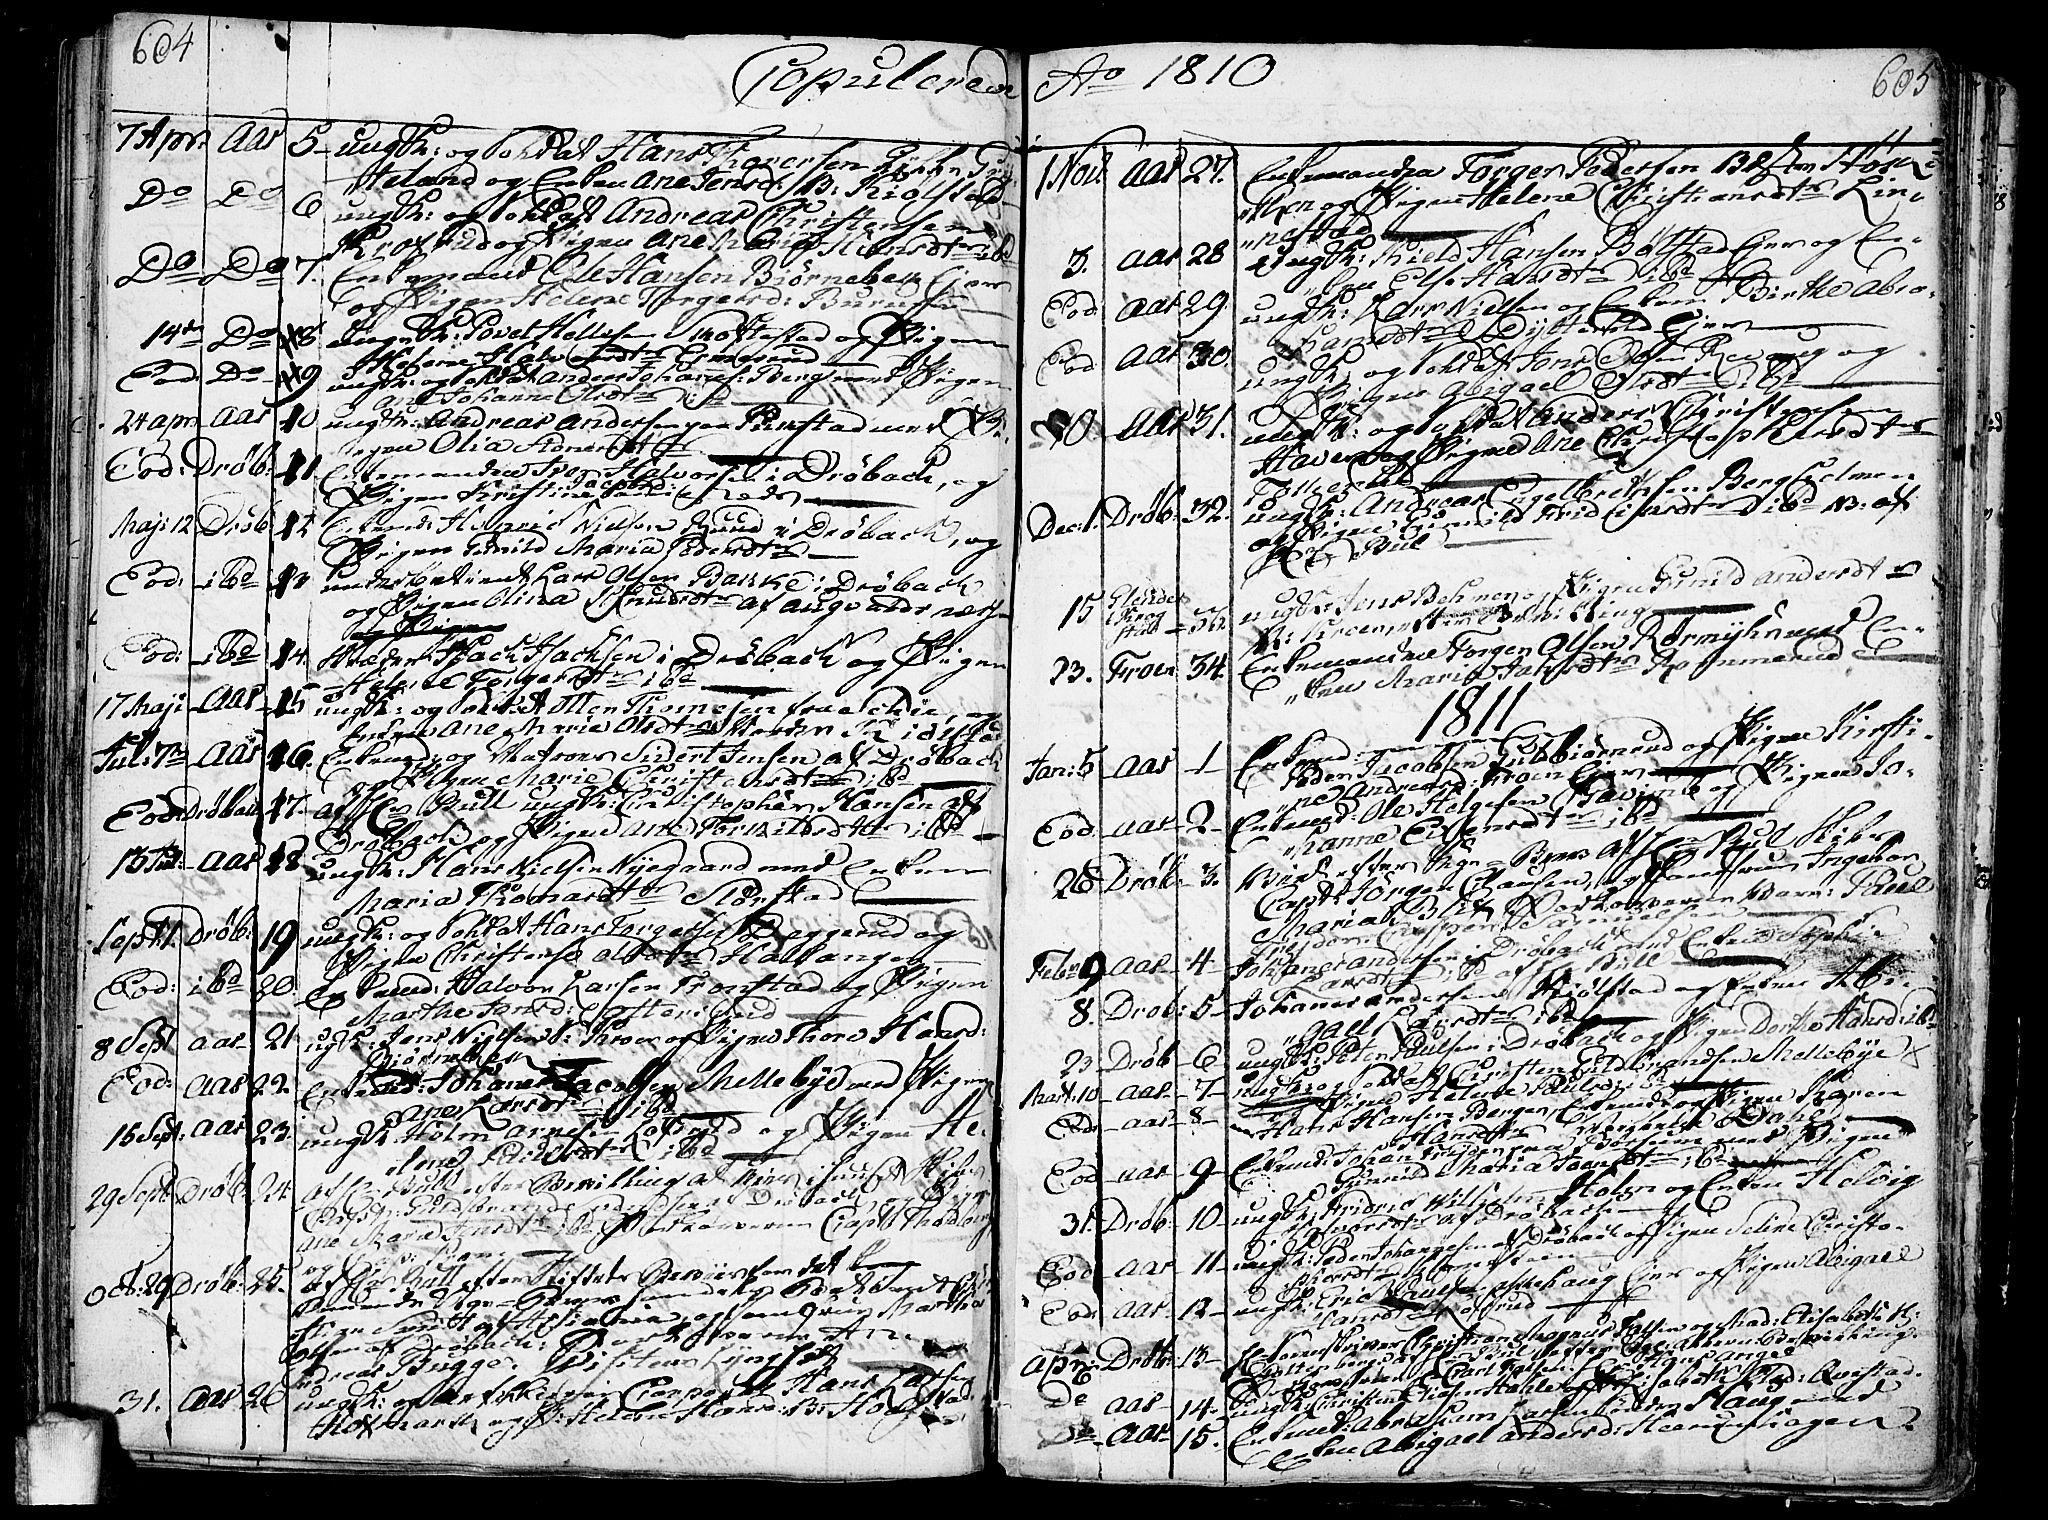 SAO, Ås prestekontor Kirkebøker, F/Fa/L0002: Parish register (official) no. I 2, 1778-1813, p. 604-605